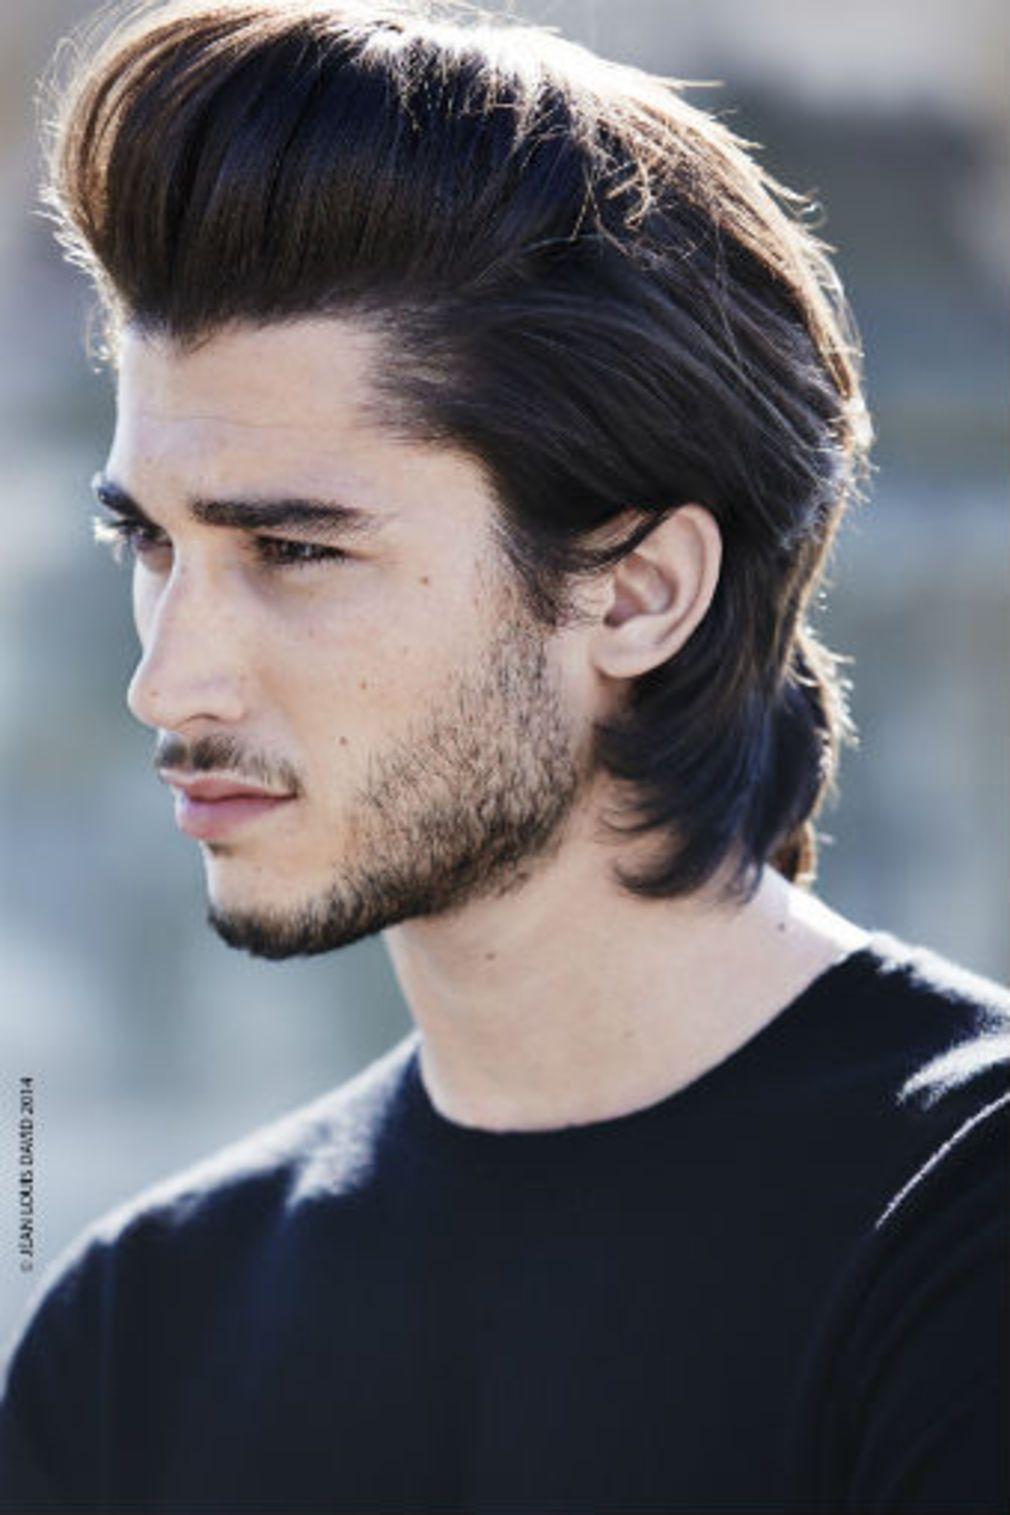 Peinados De Los 80 Hombres : peinados, hombres, Peinados, Hombres, Ideas, Peinado